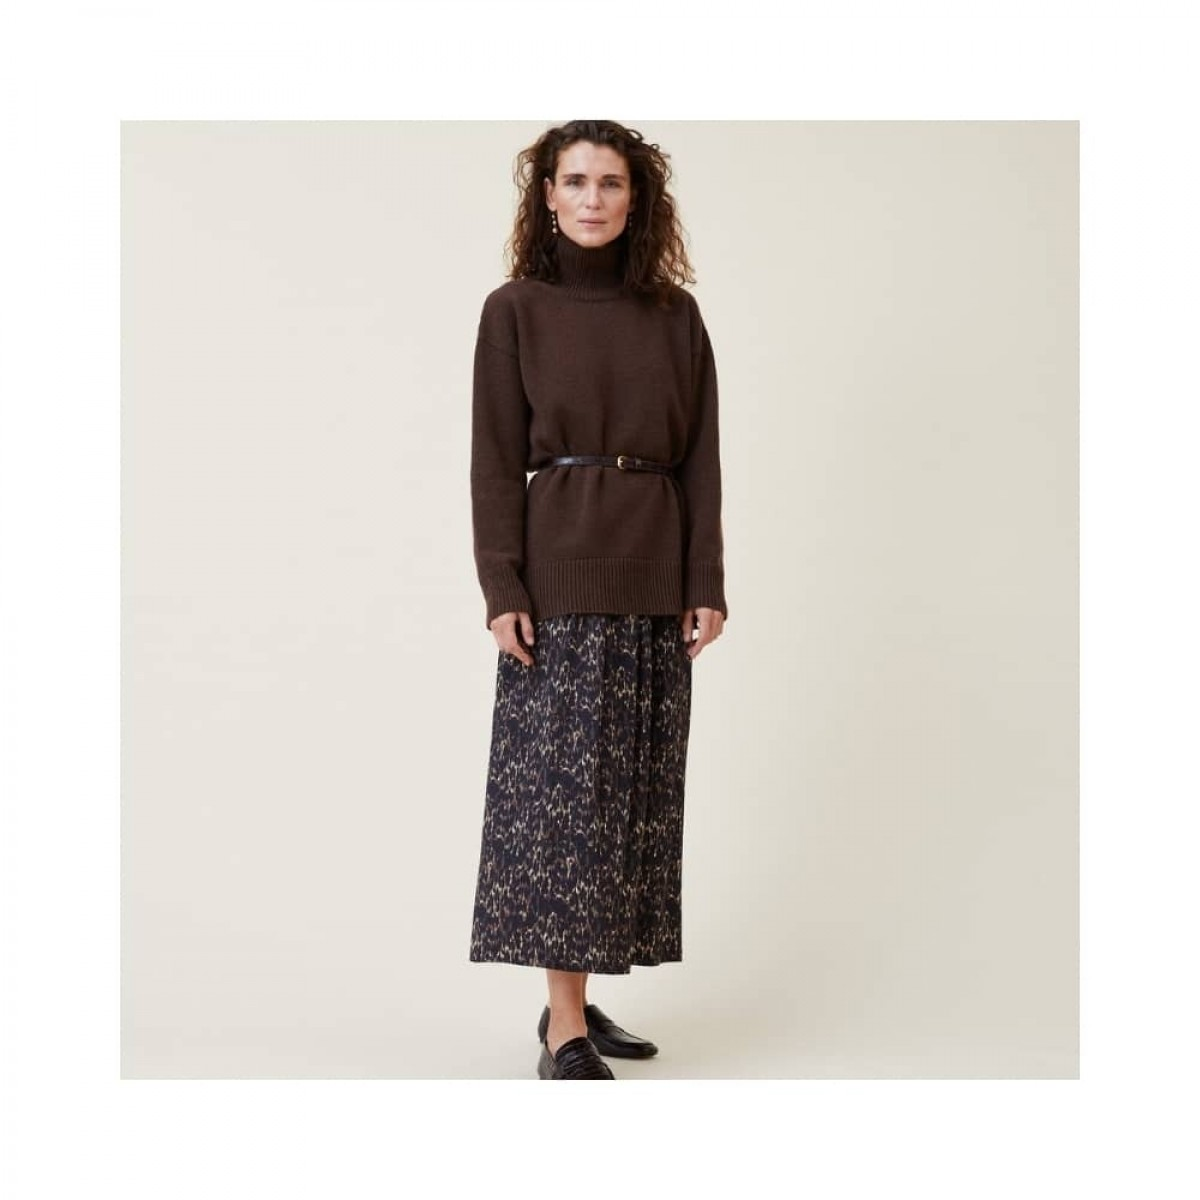 manny pullover - dark brown - model front